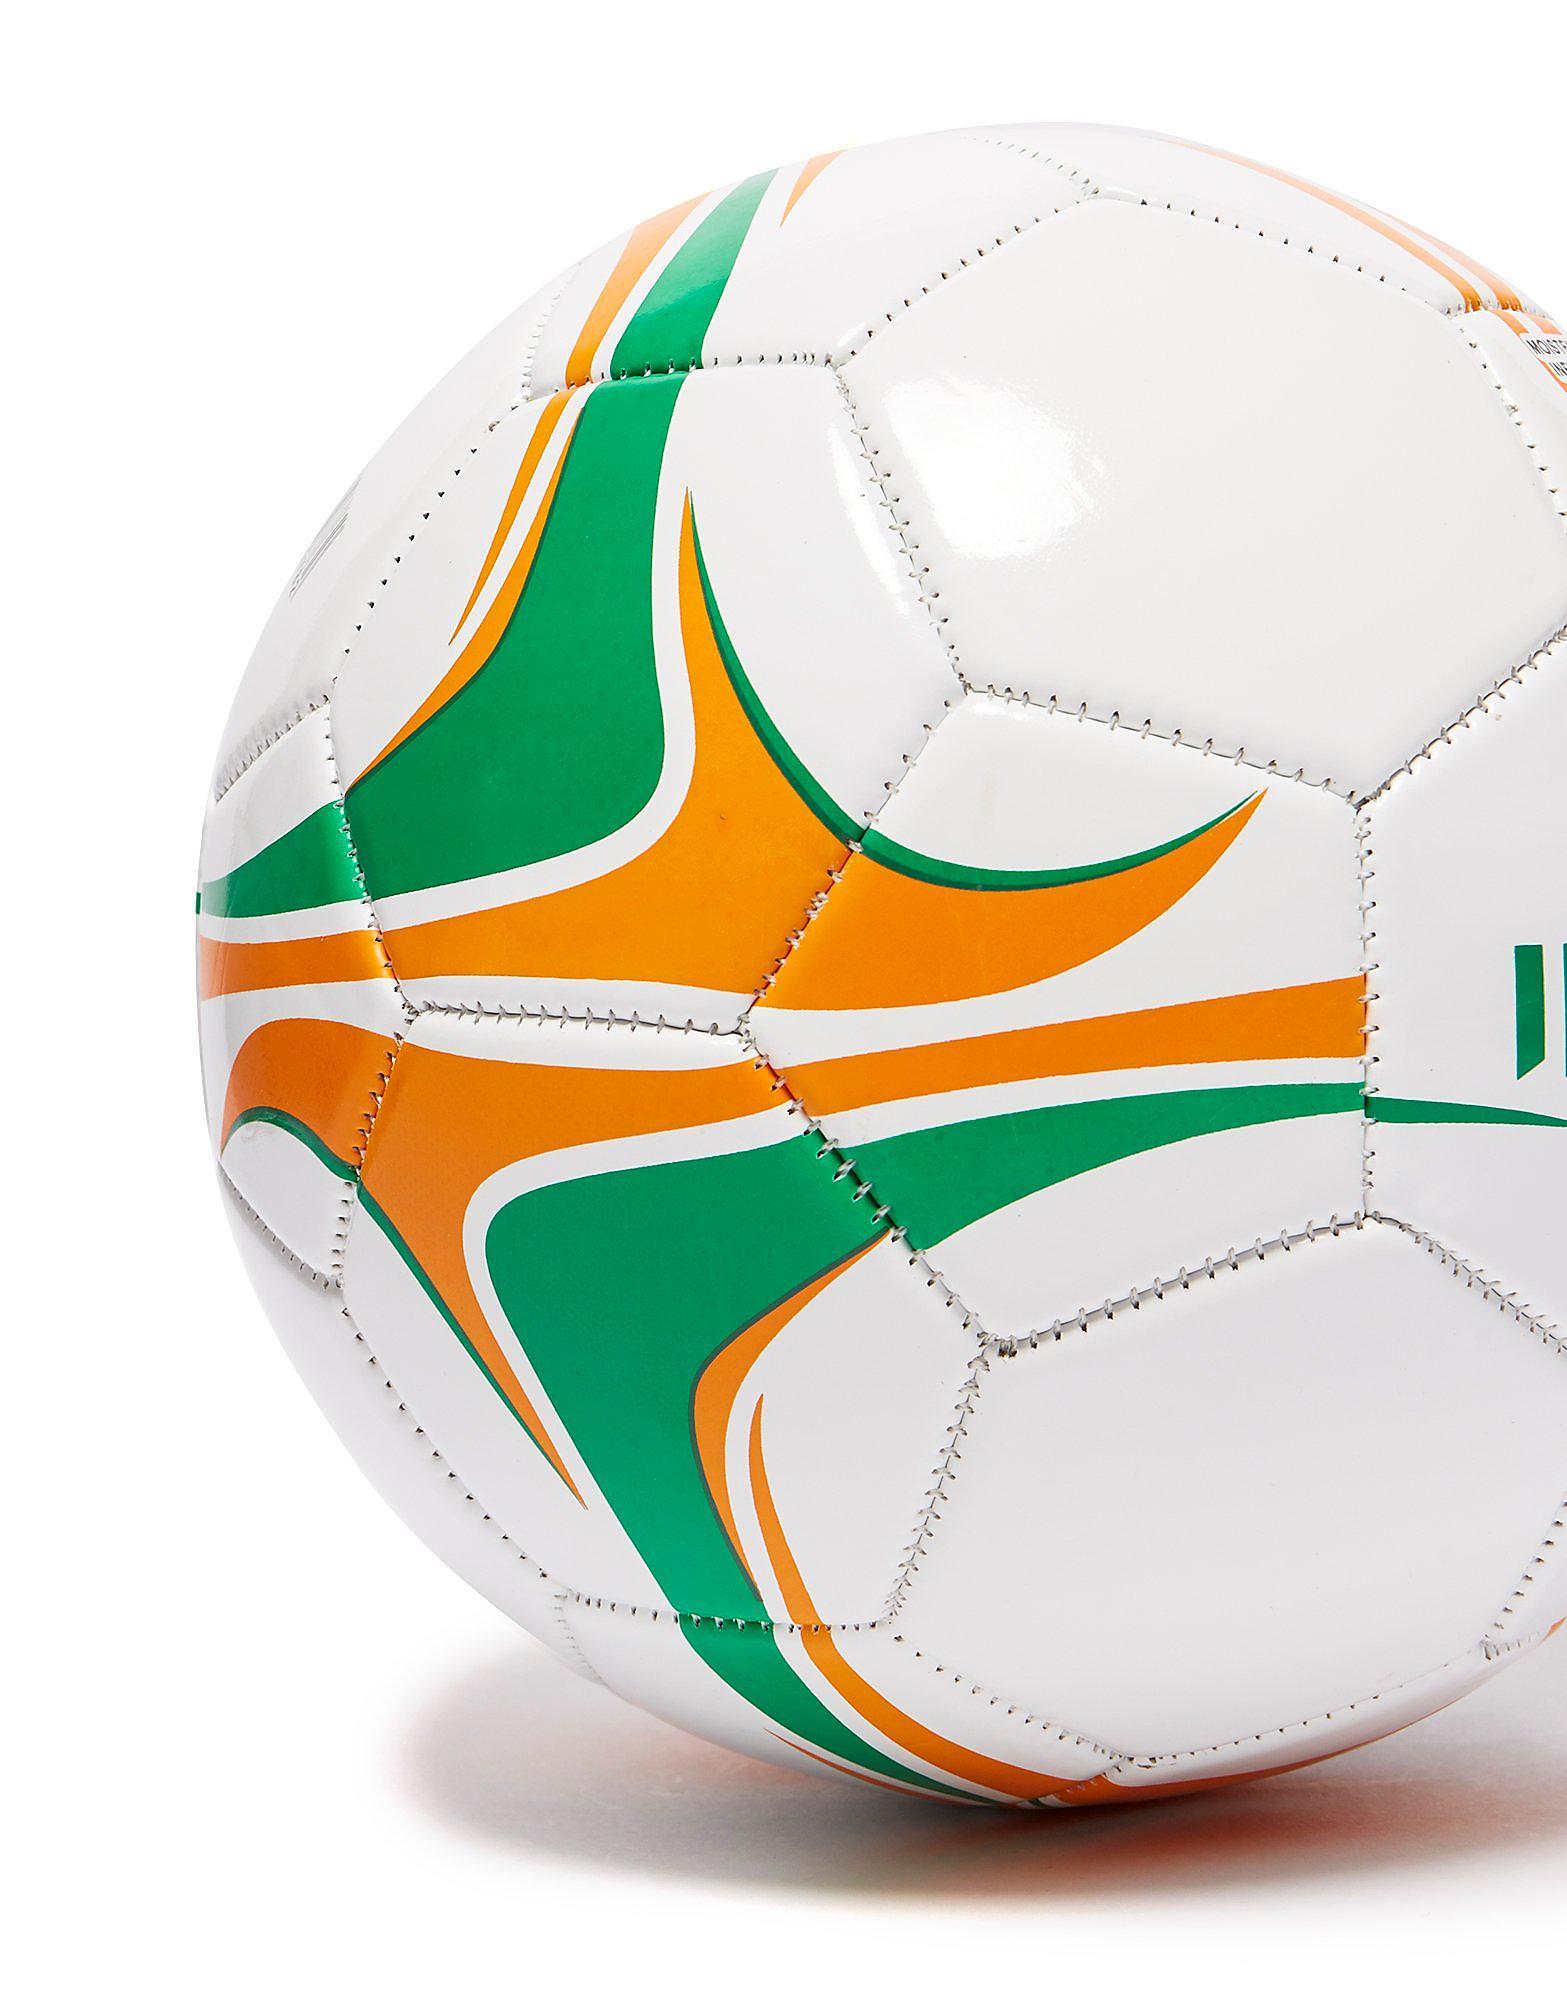 Daricia Republic of Ireland Football